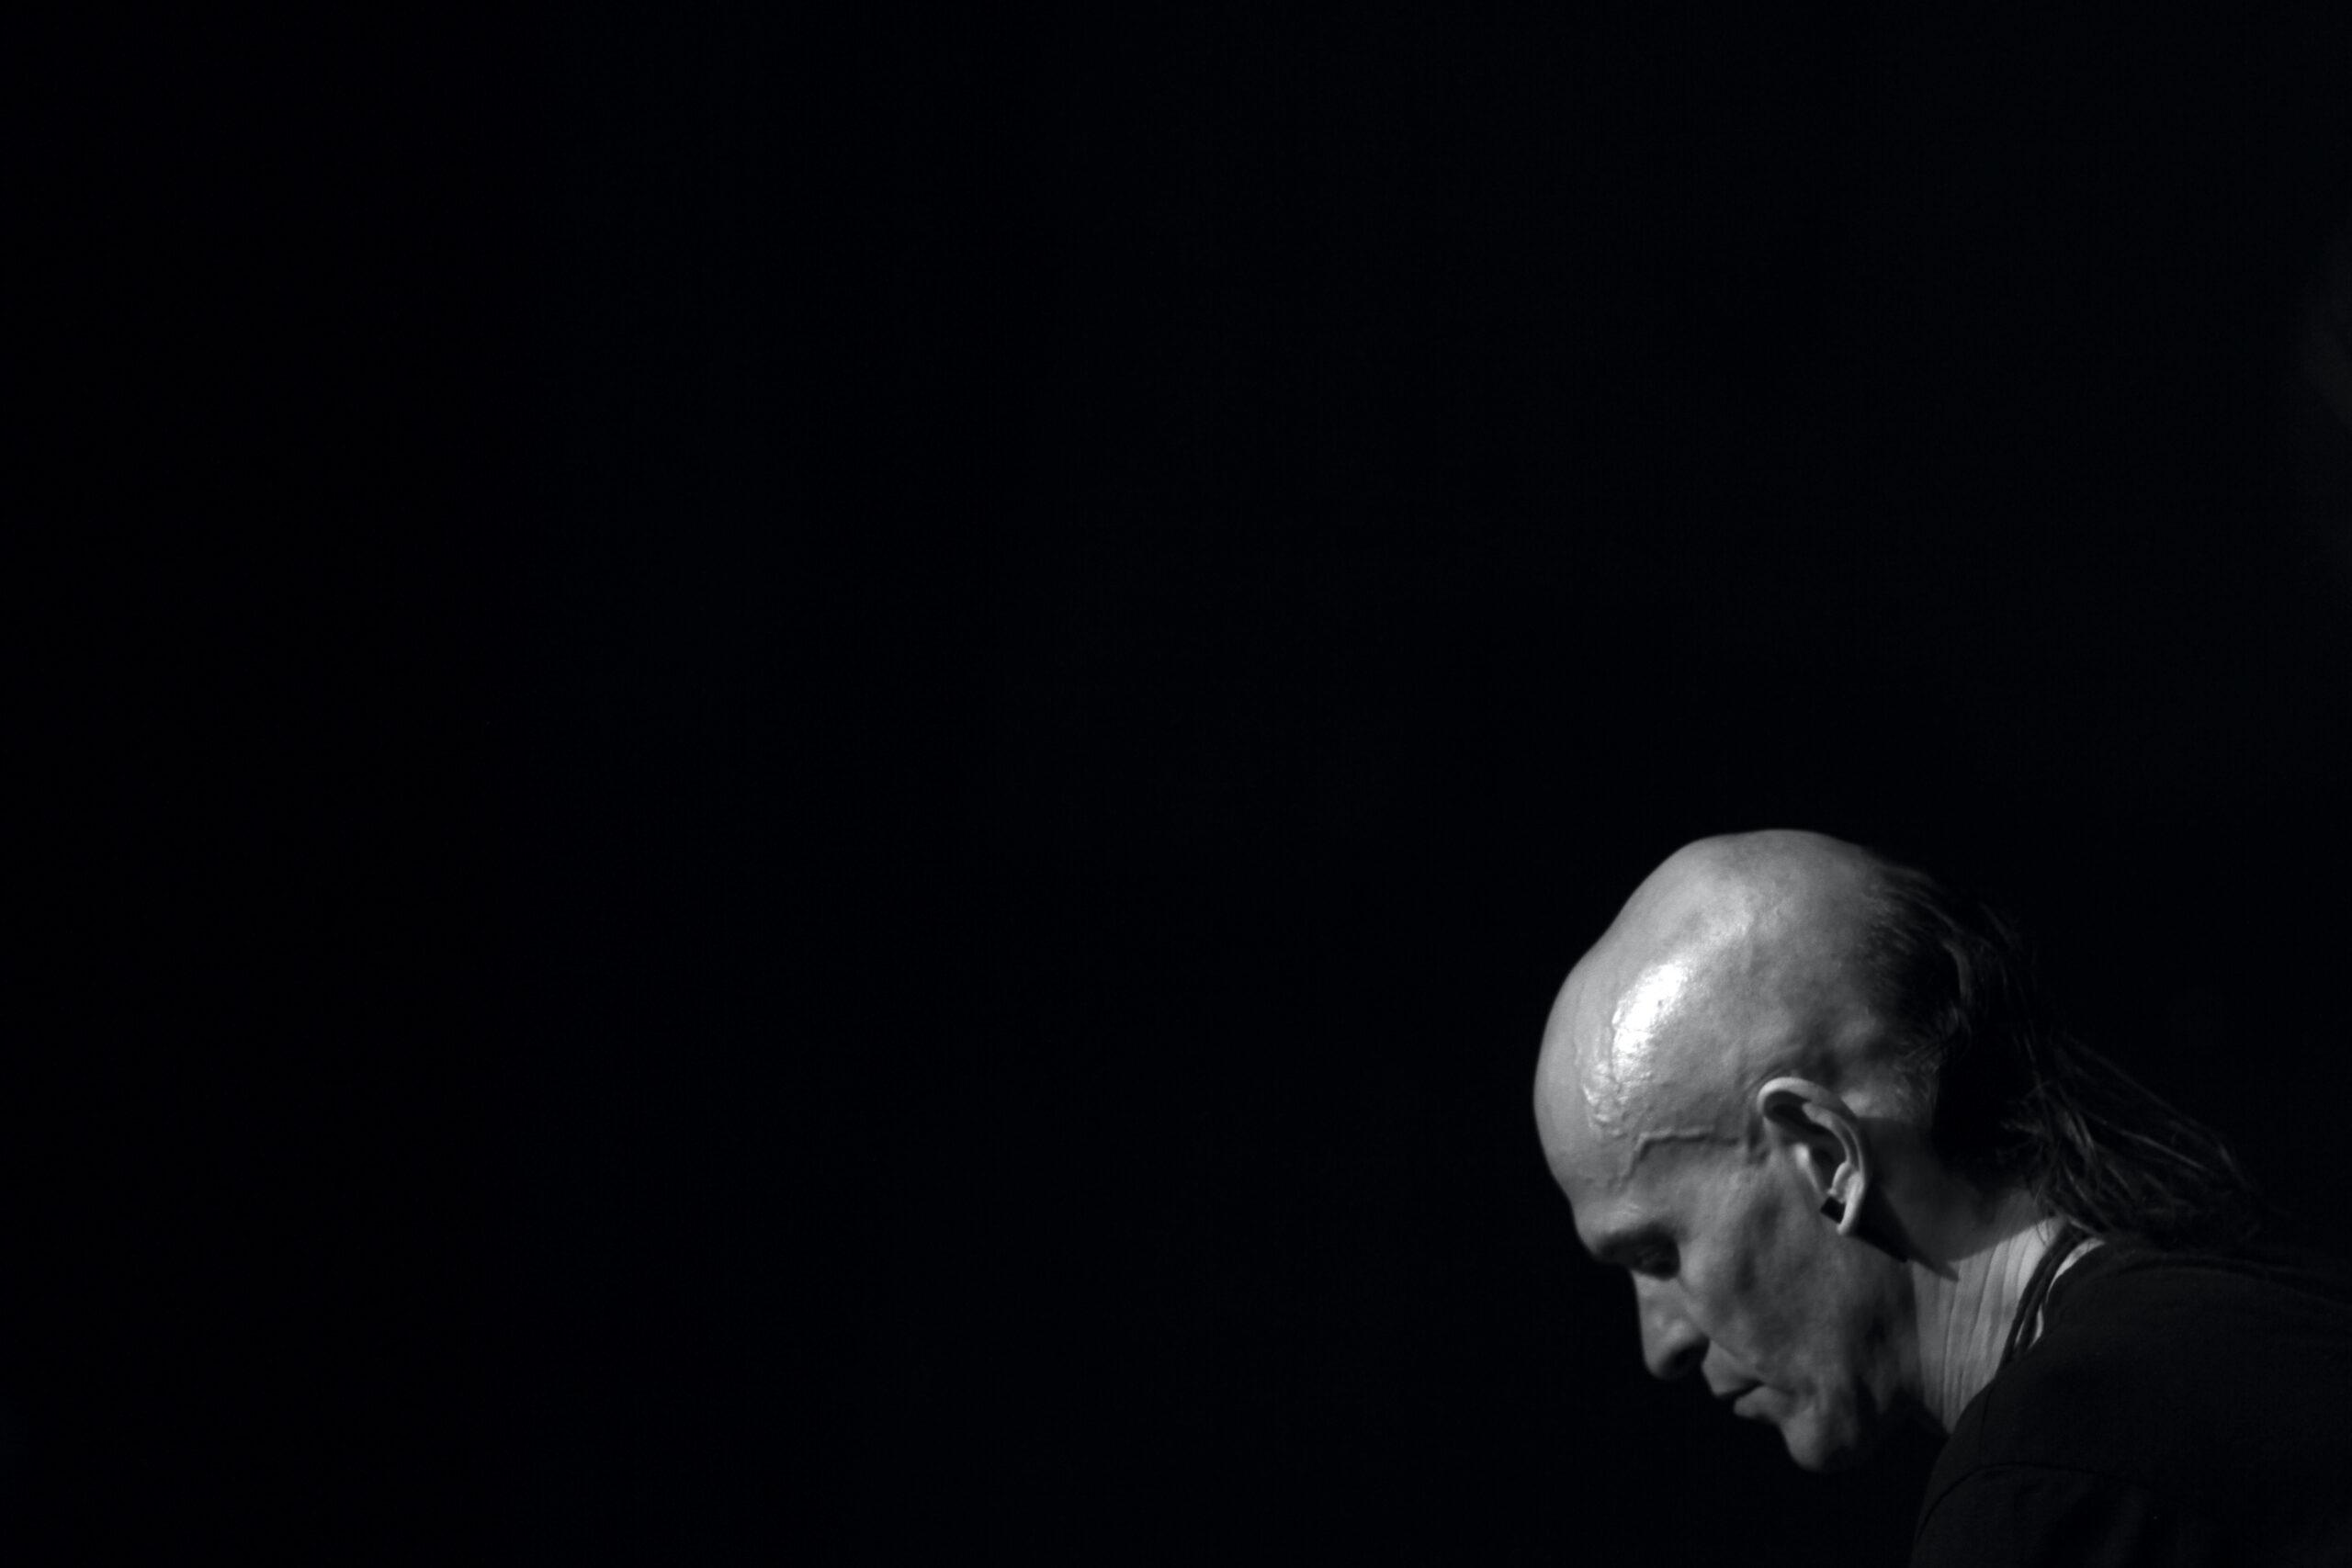 דייב פיליפס, אמן פסיכו-אקוסטיקה ואקטיביסט (צילום: SaoPauloByFred!)